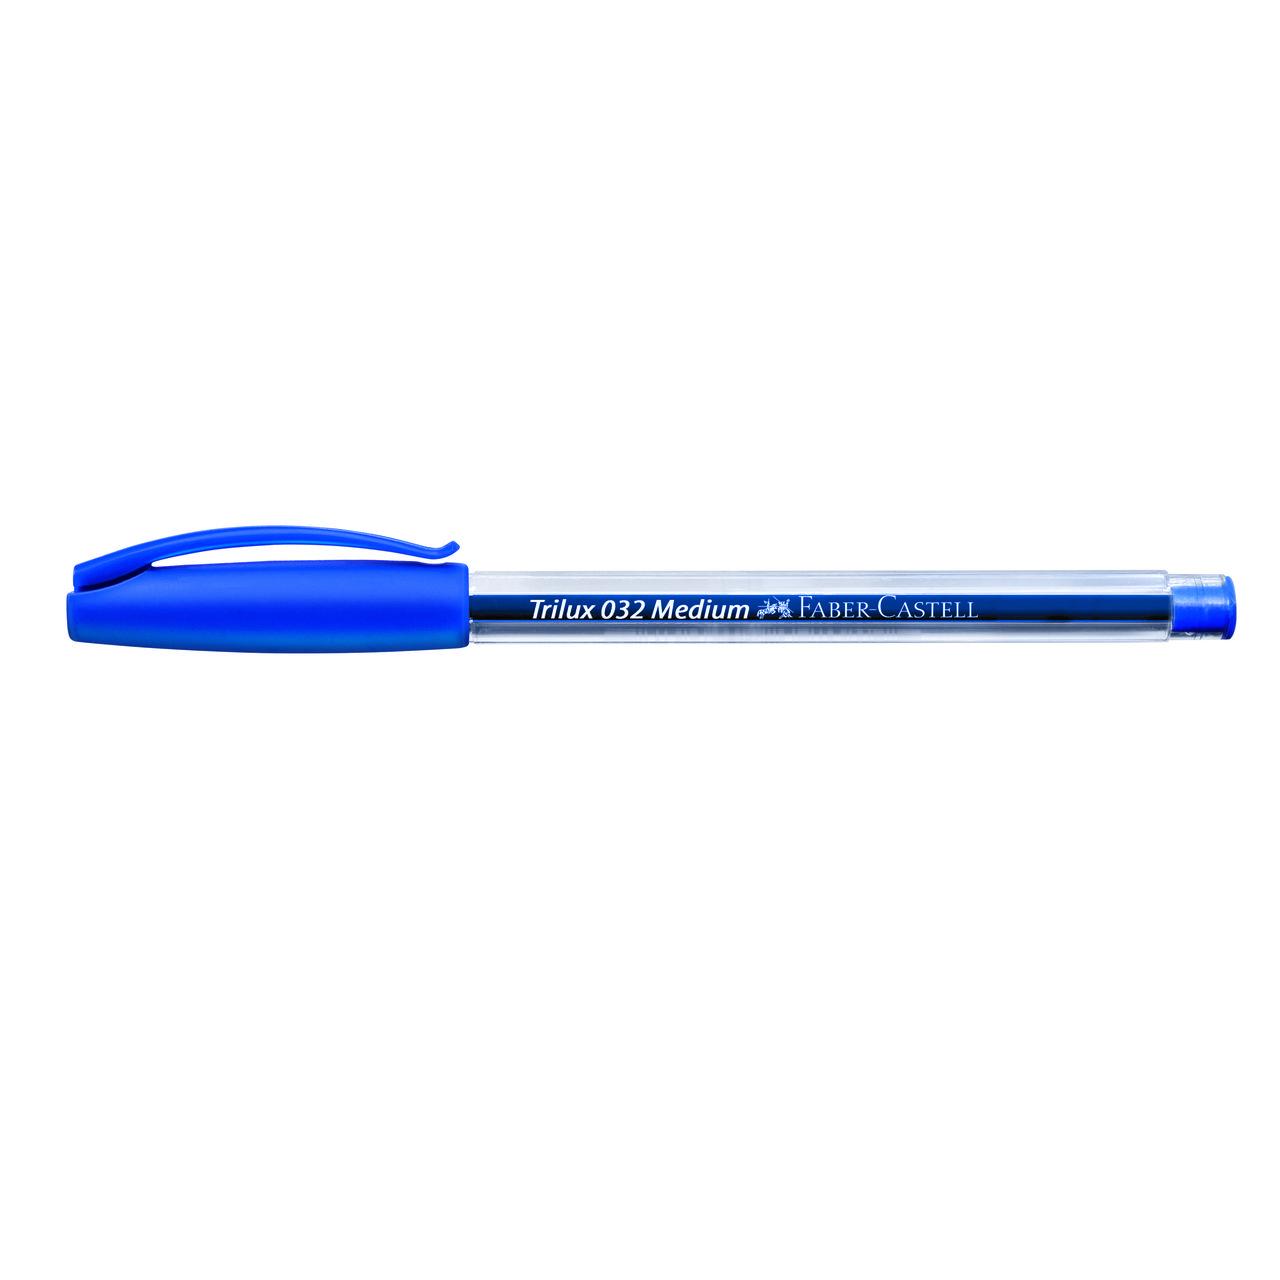 Caneta esferográfica 1.0 azul TRILUX Faber-Castell